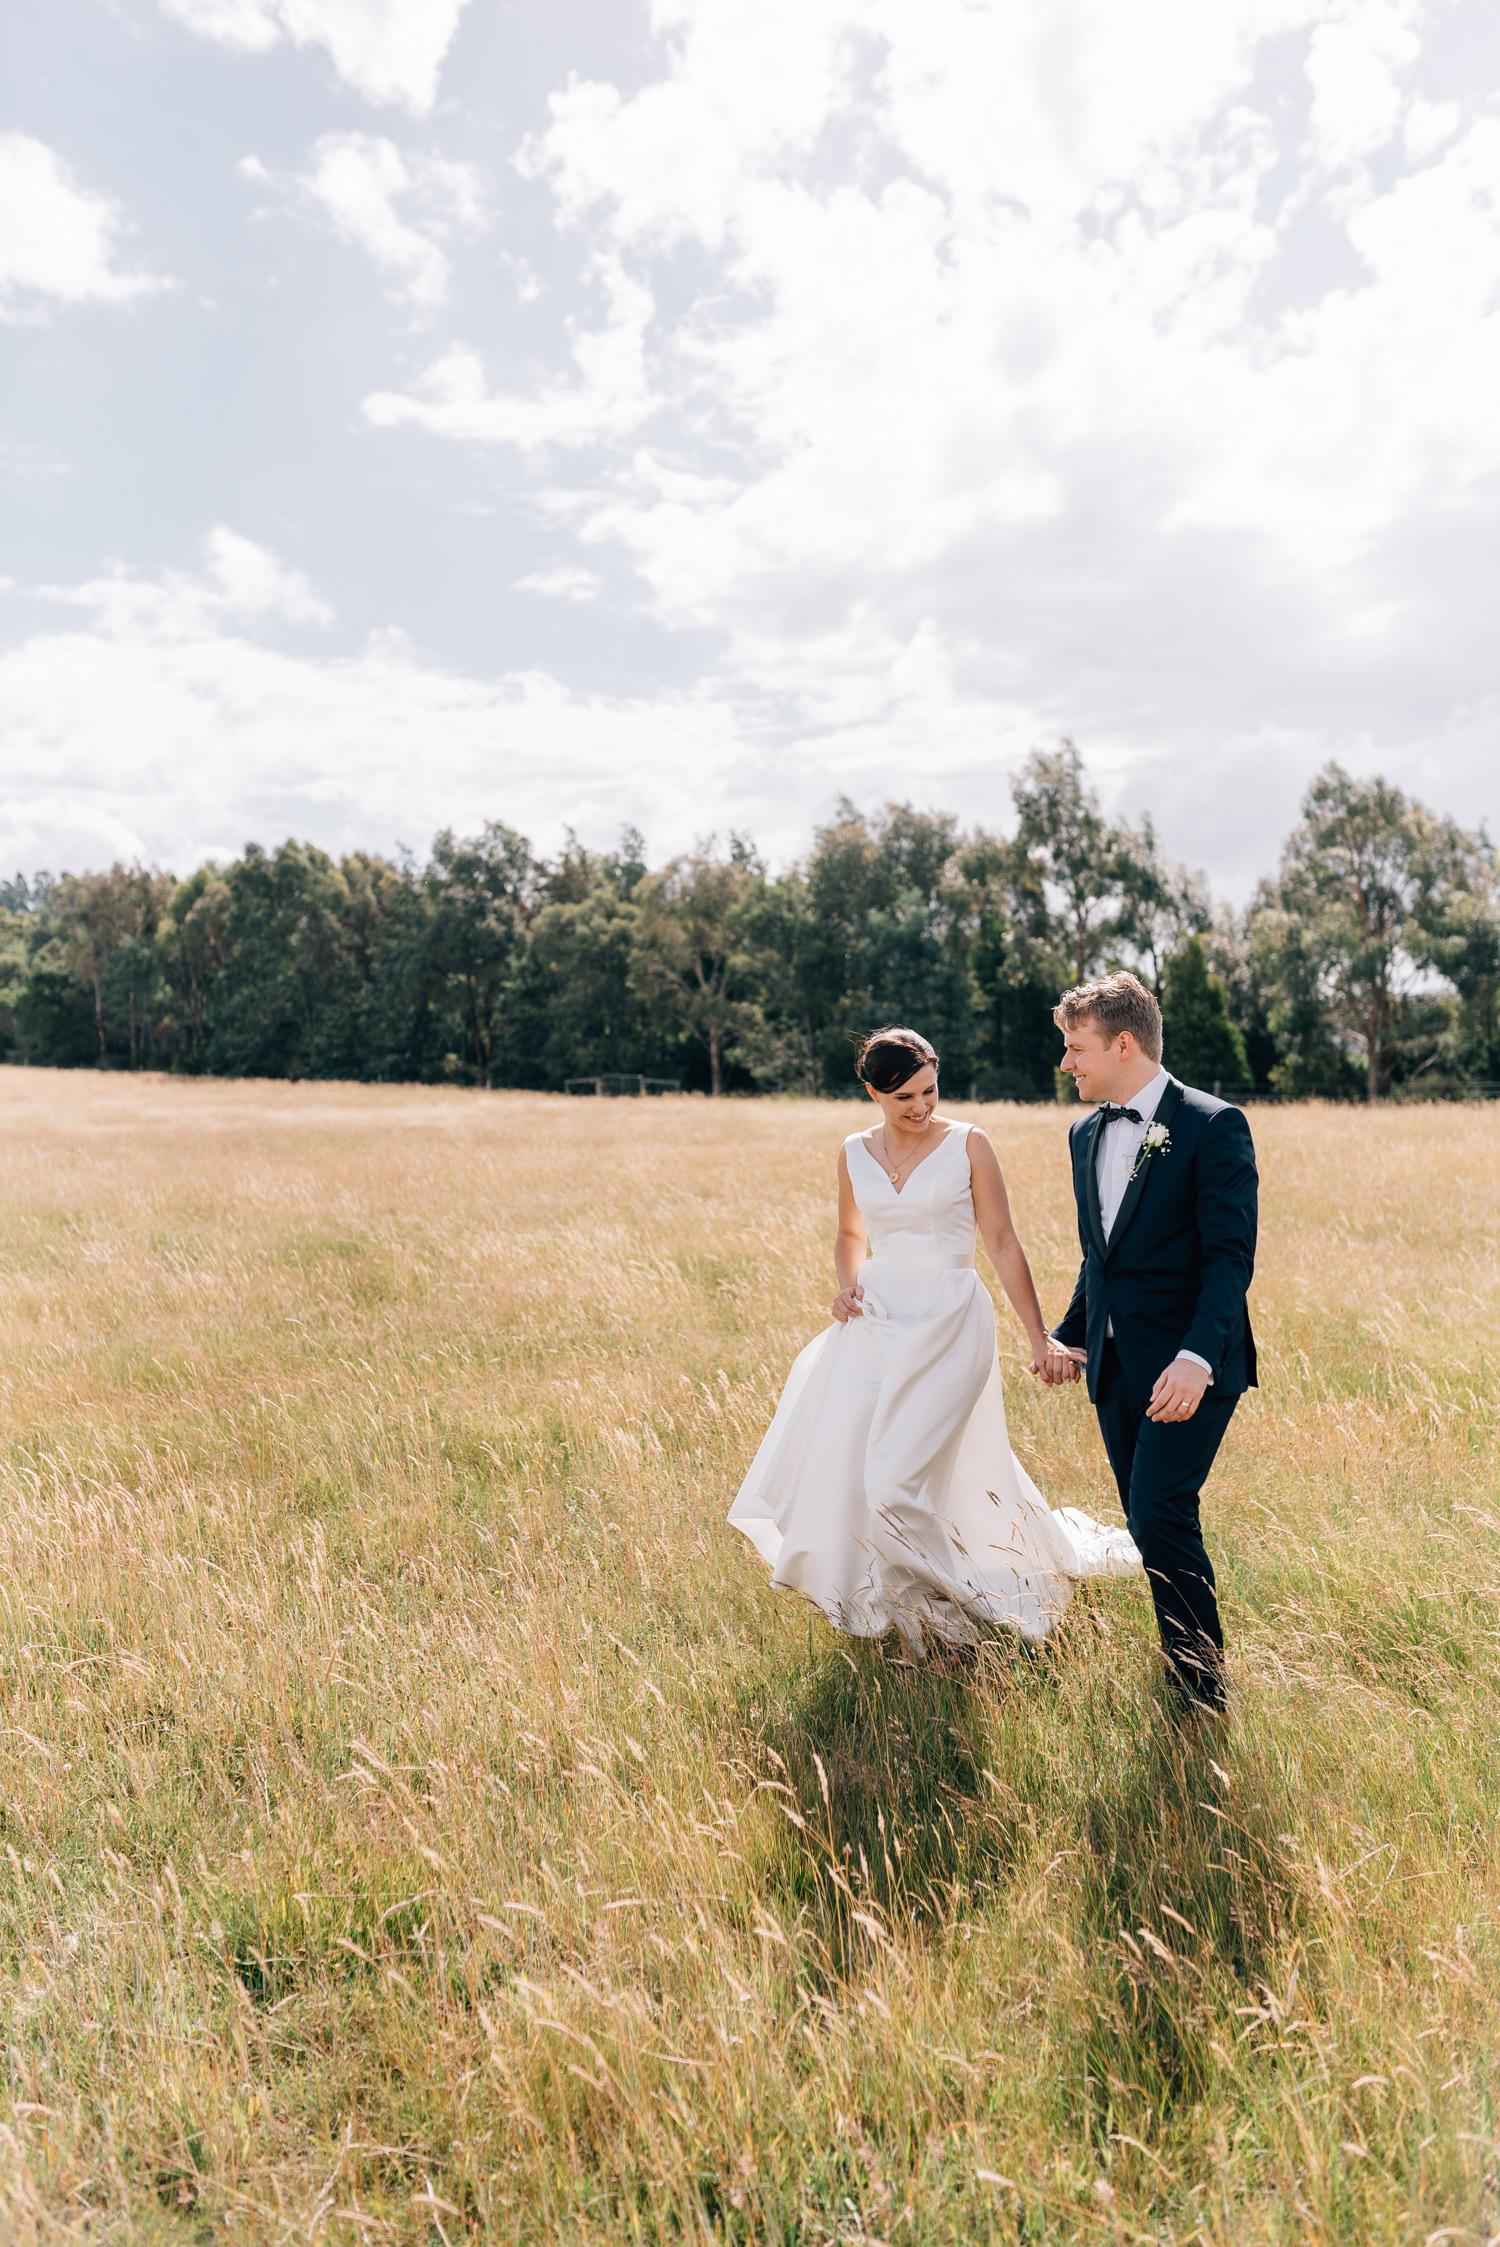 Josef-Chromy-Wedding-Photographer-66.jpg